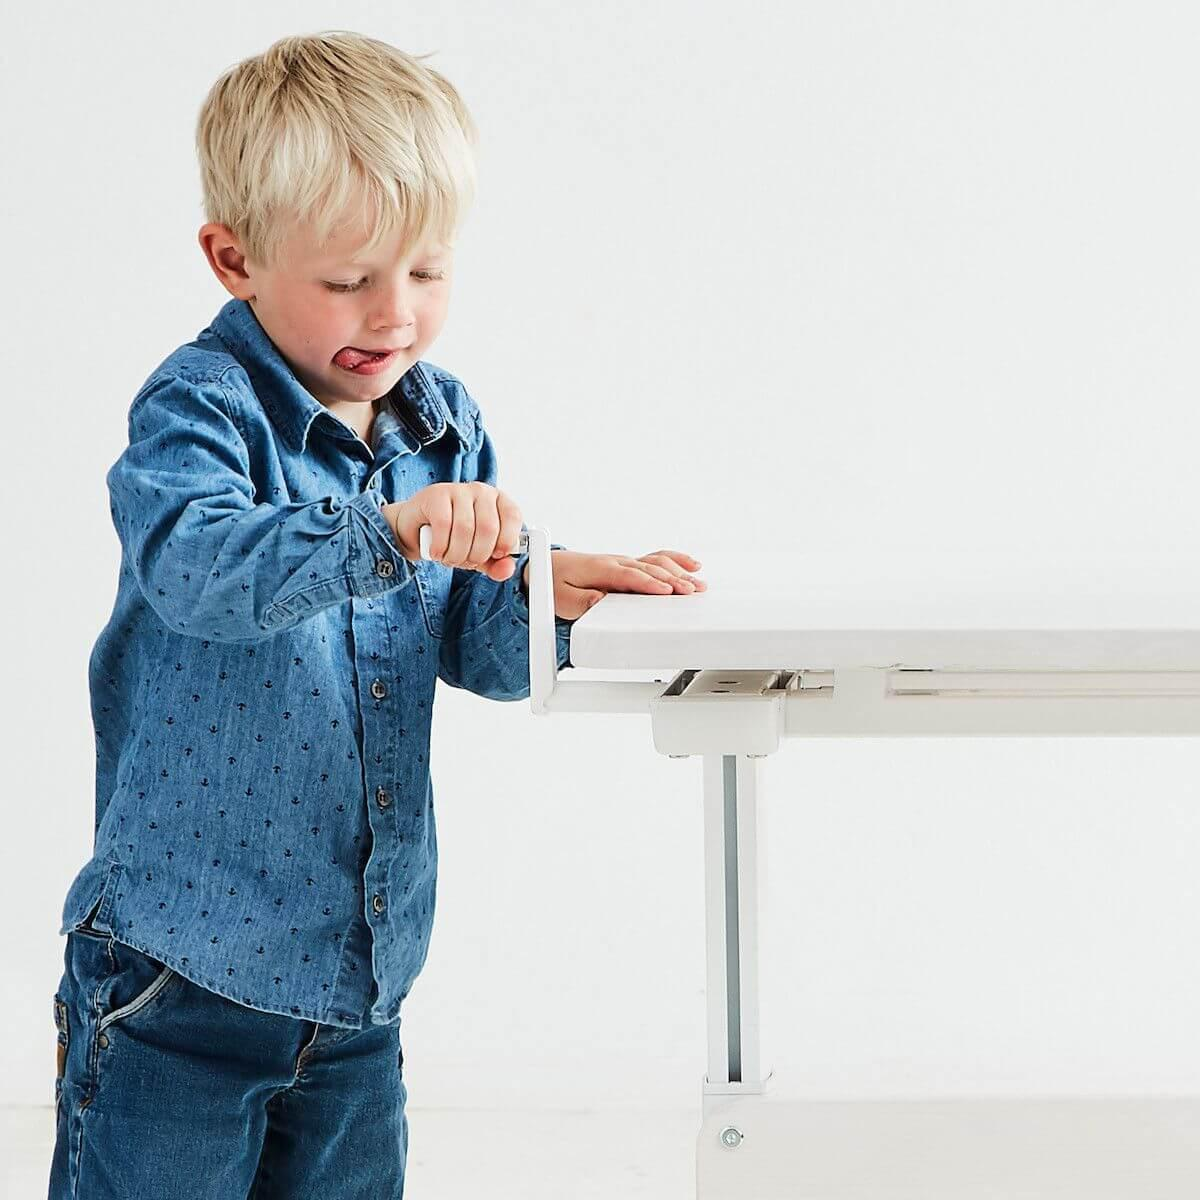 Escritorio infantil ajustable con marco metálico CLASSIC Flexa blanco cal